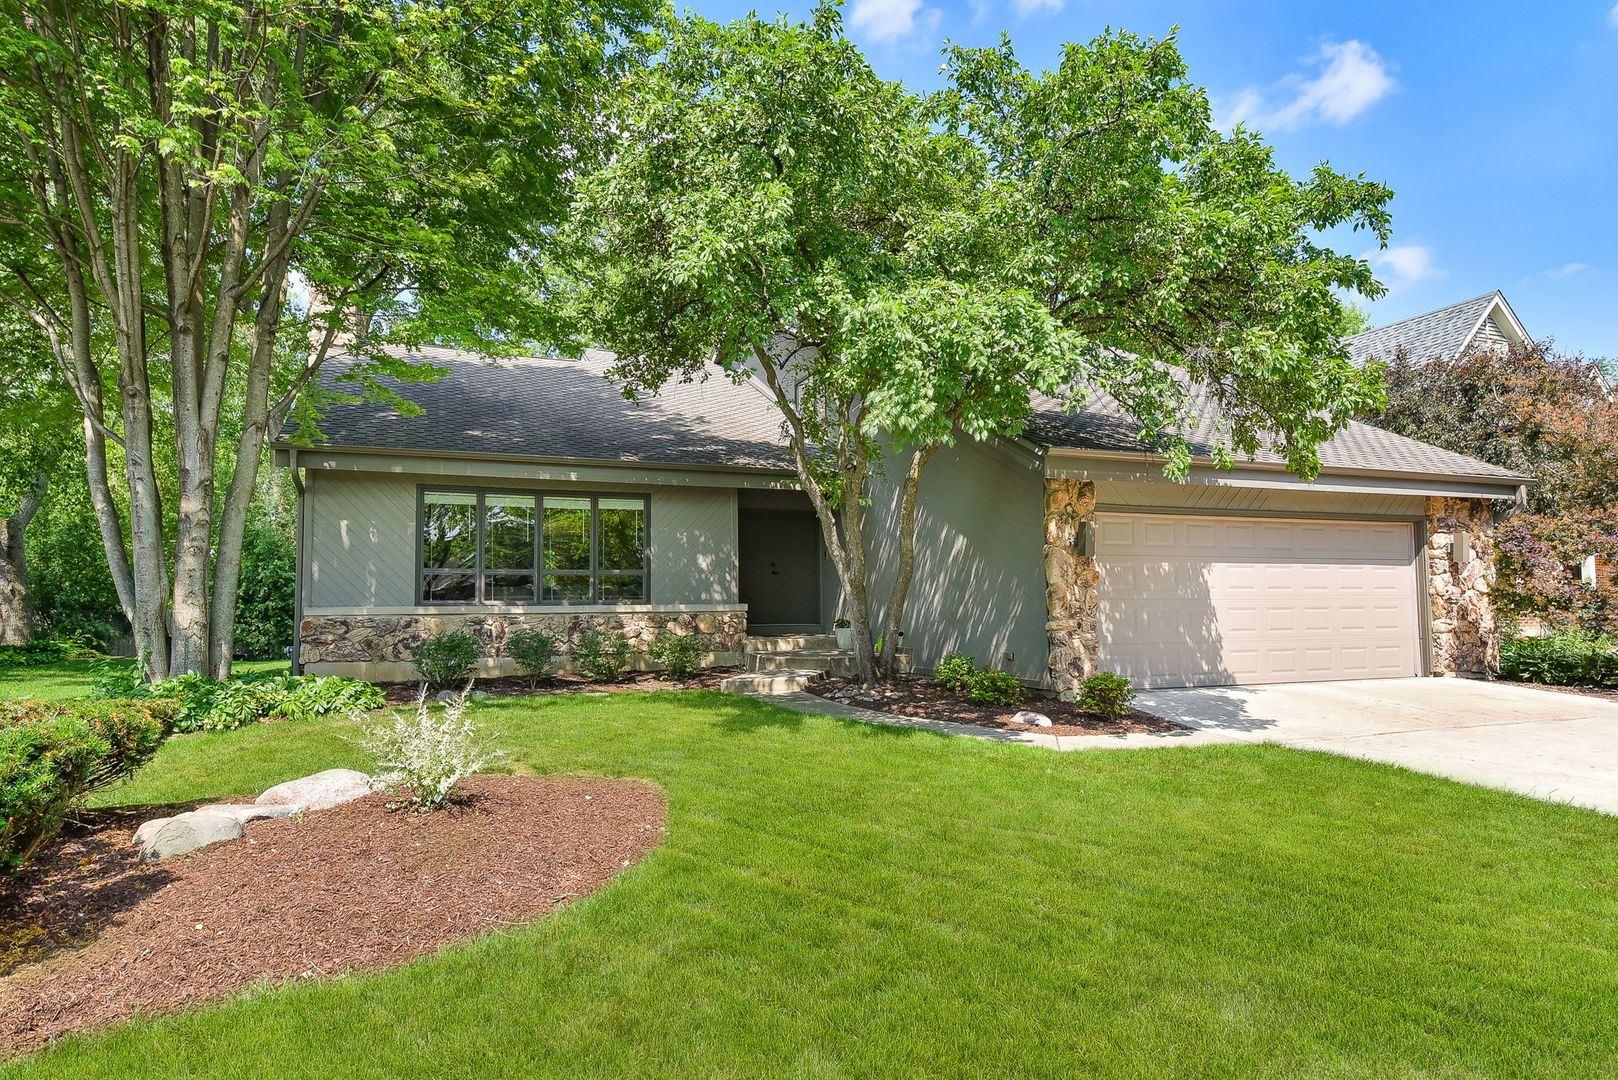 Photo of 2S004 Lakewood Lane, Wheaton, IL 60189 (MLS # 11119126)